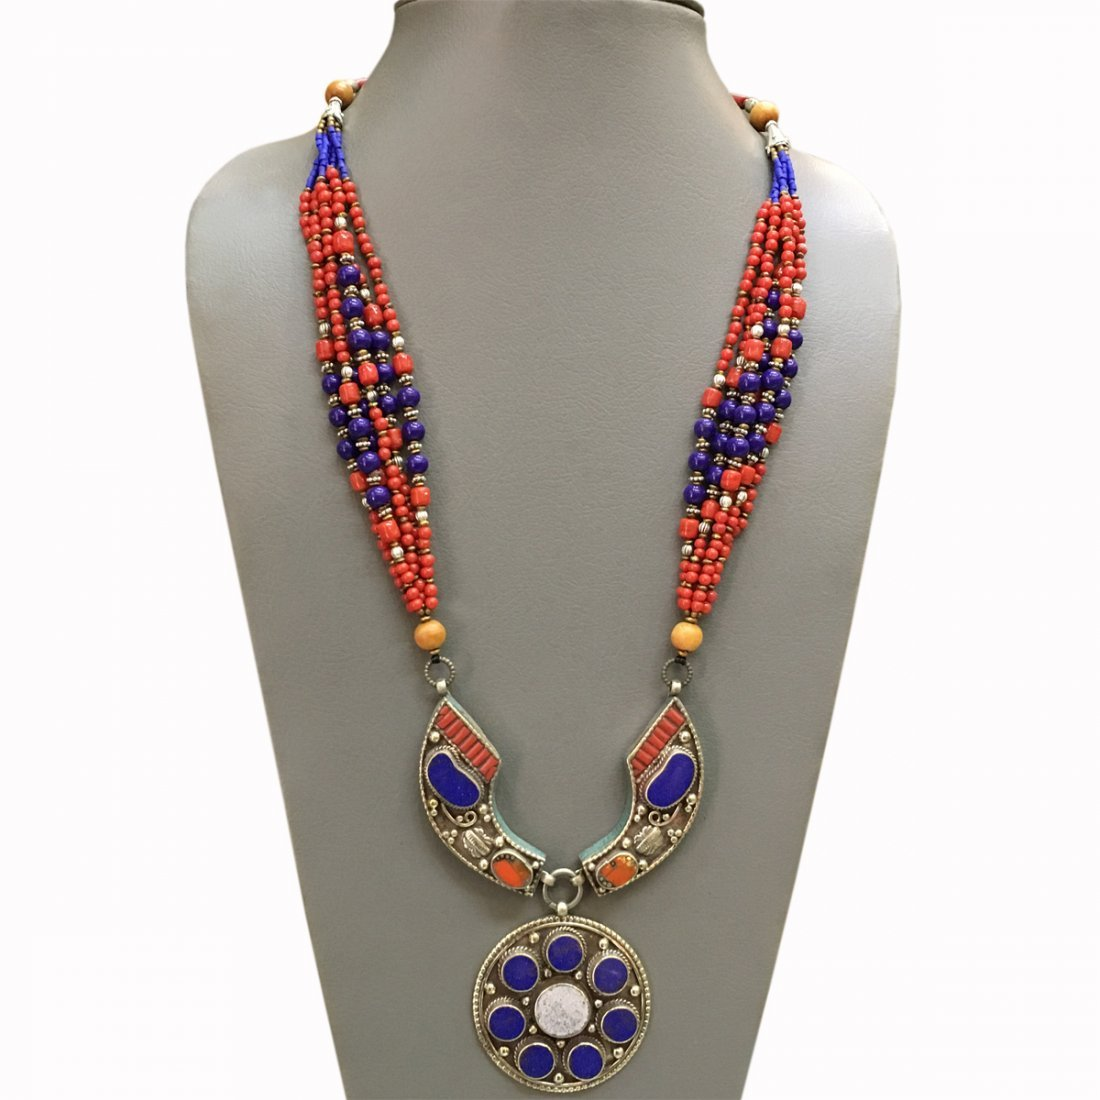 Old Vintage Lapis & Coral Tibetan Asian Necklace